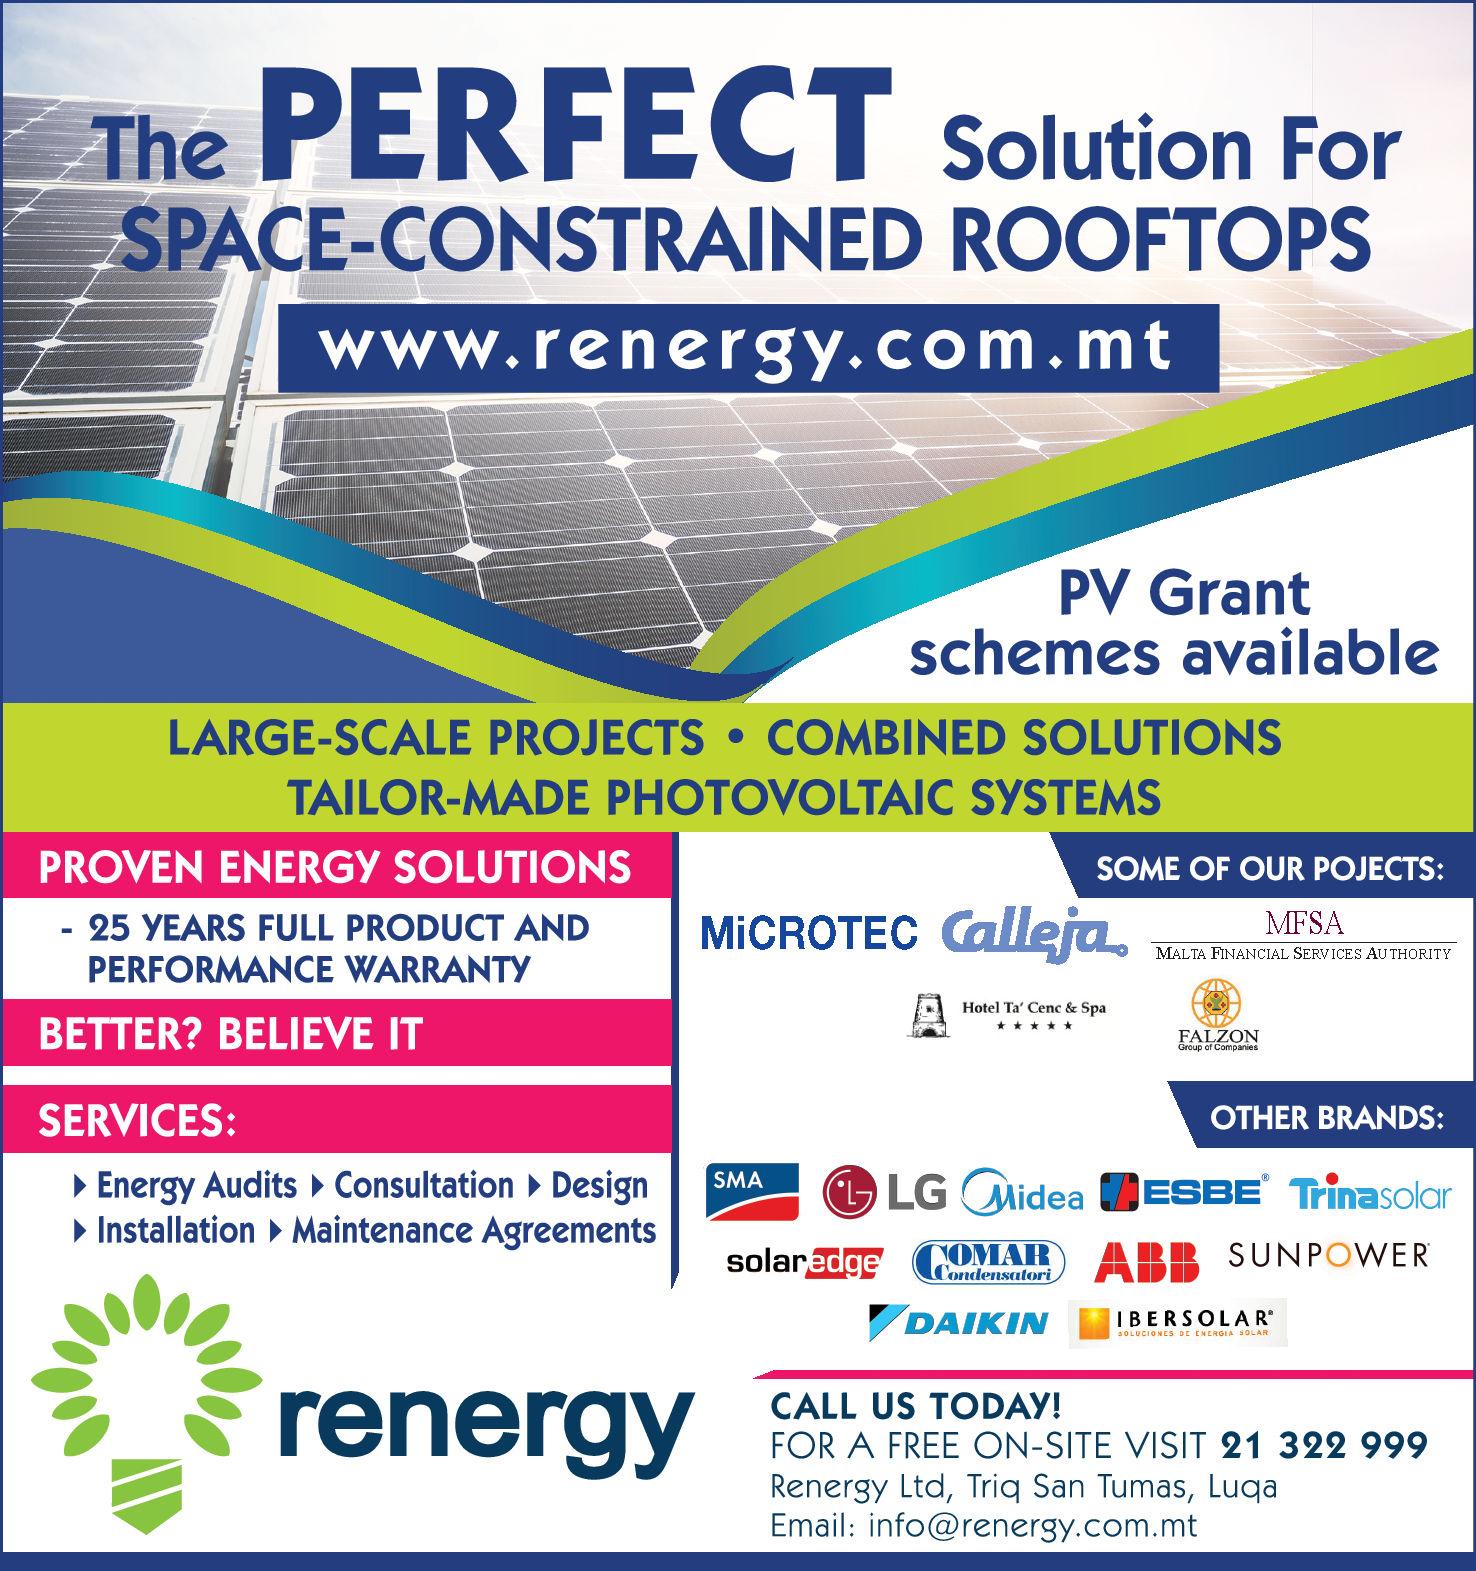 Renergy Ltd - Photovoltaic Systems in Luqa, Malta | Yellow Malta